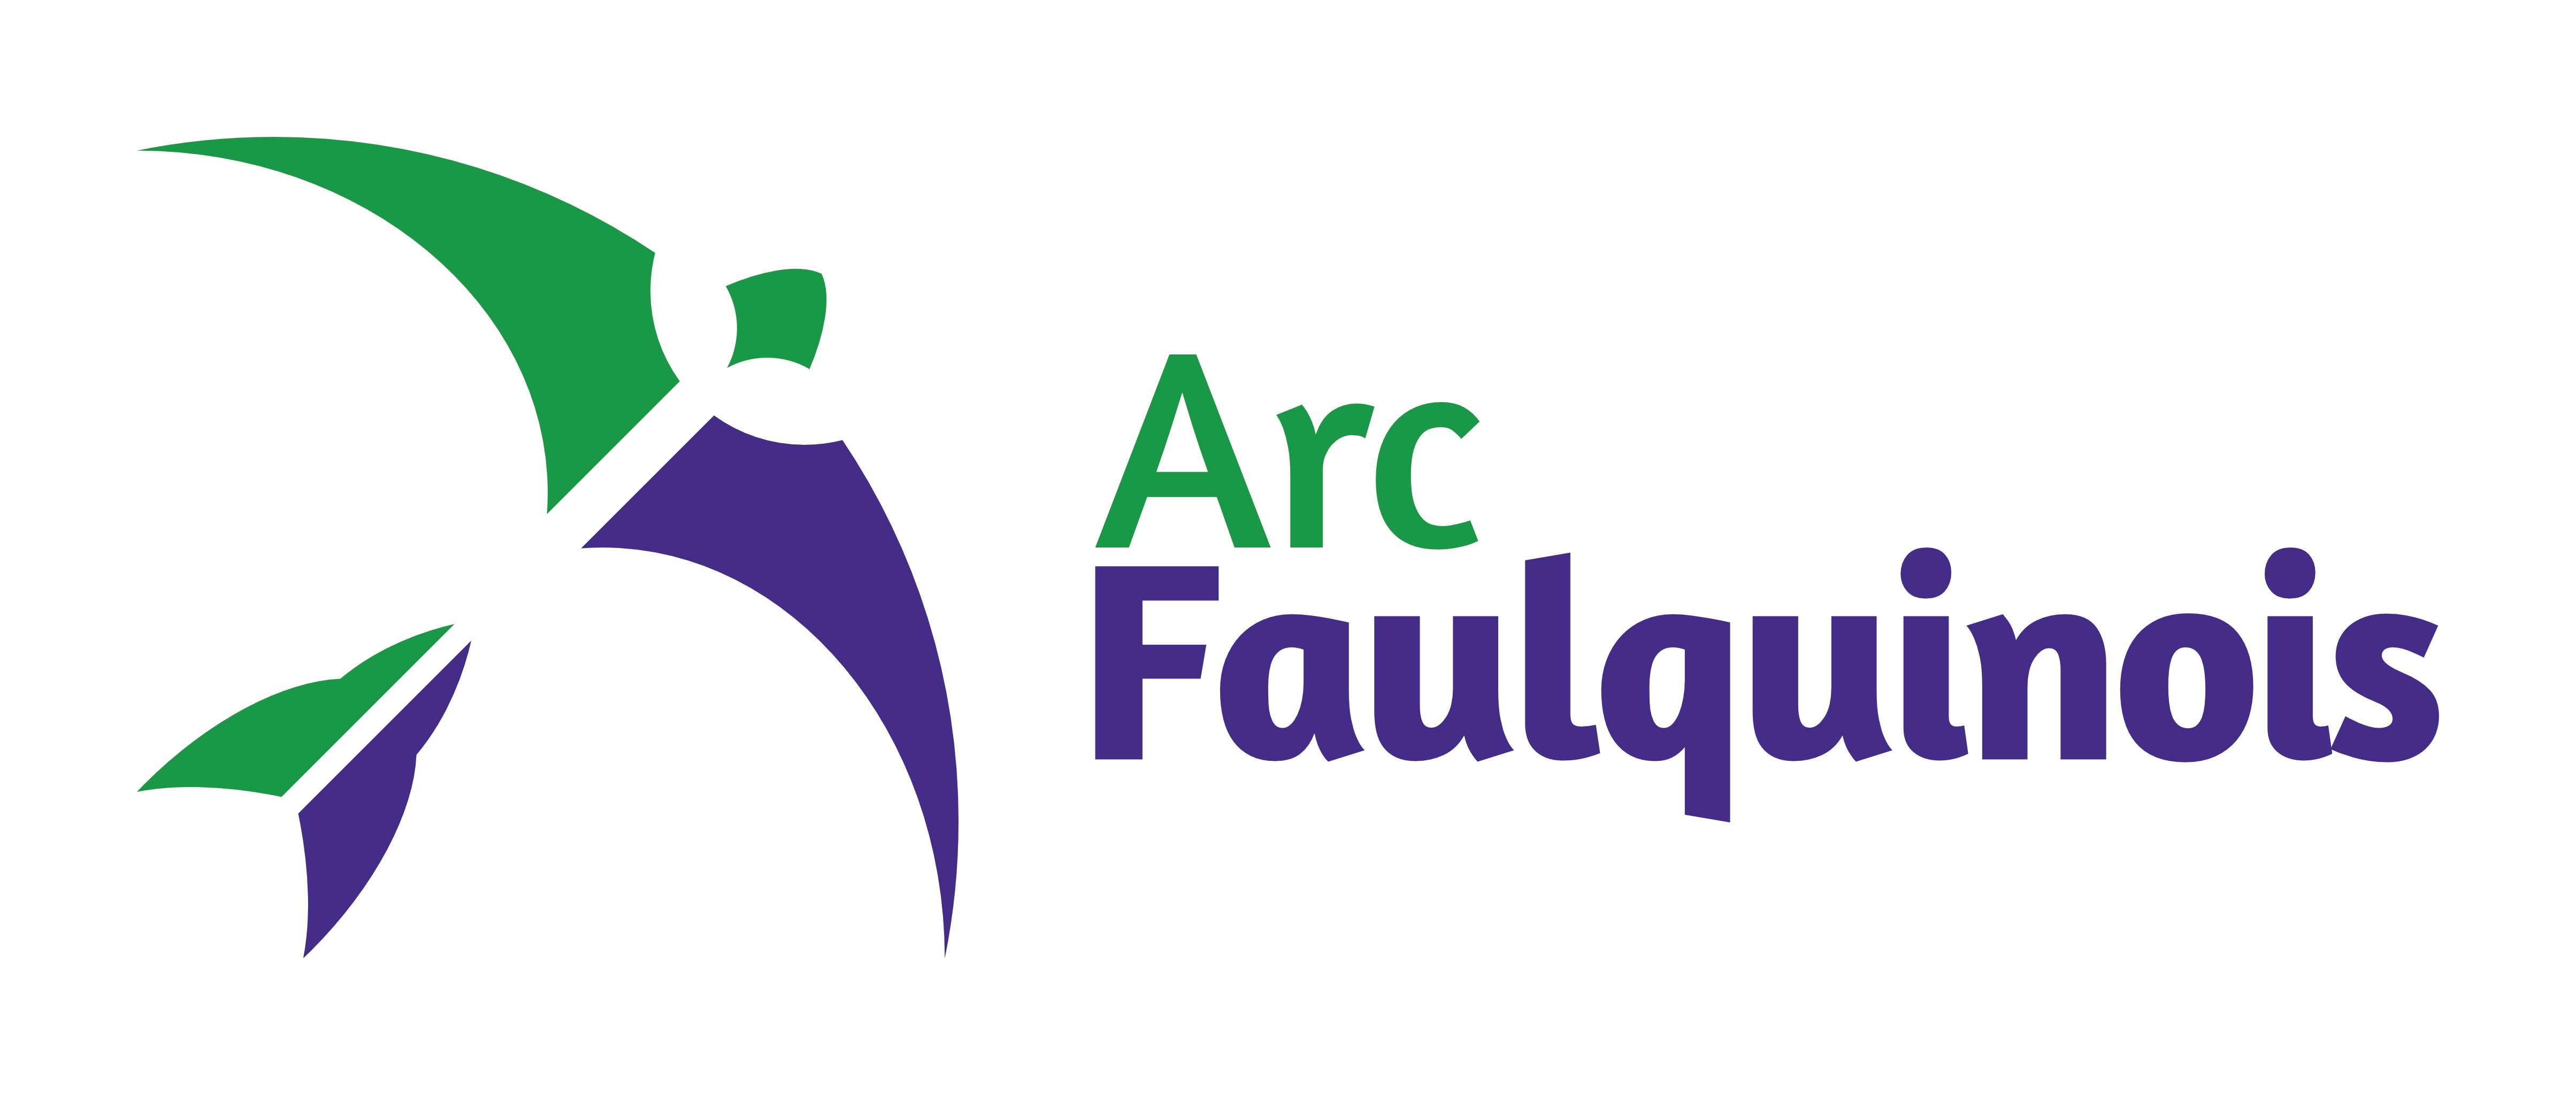 Arc Faulquinois - logo.jpg